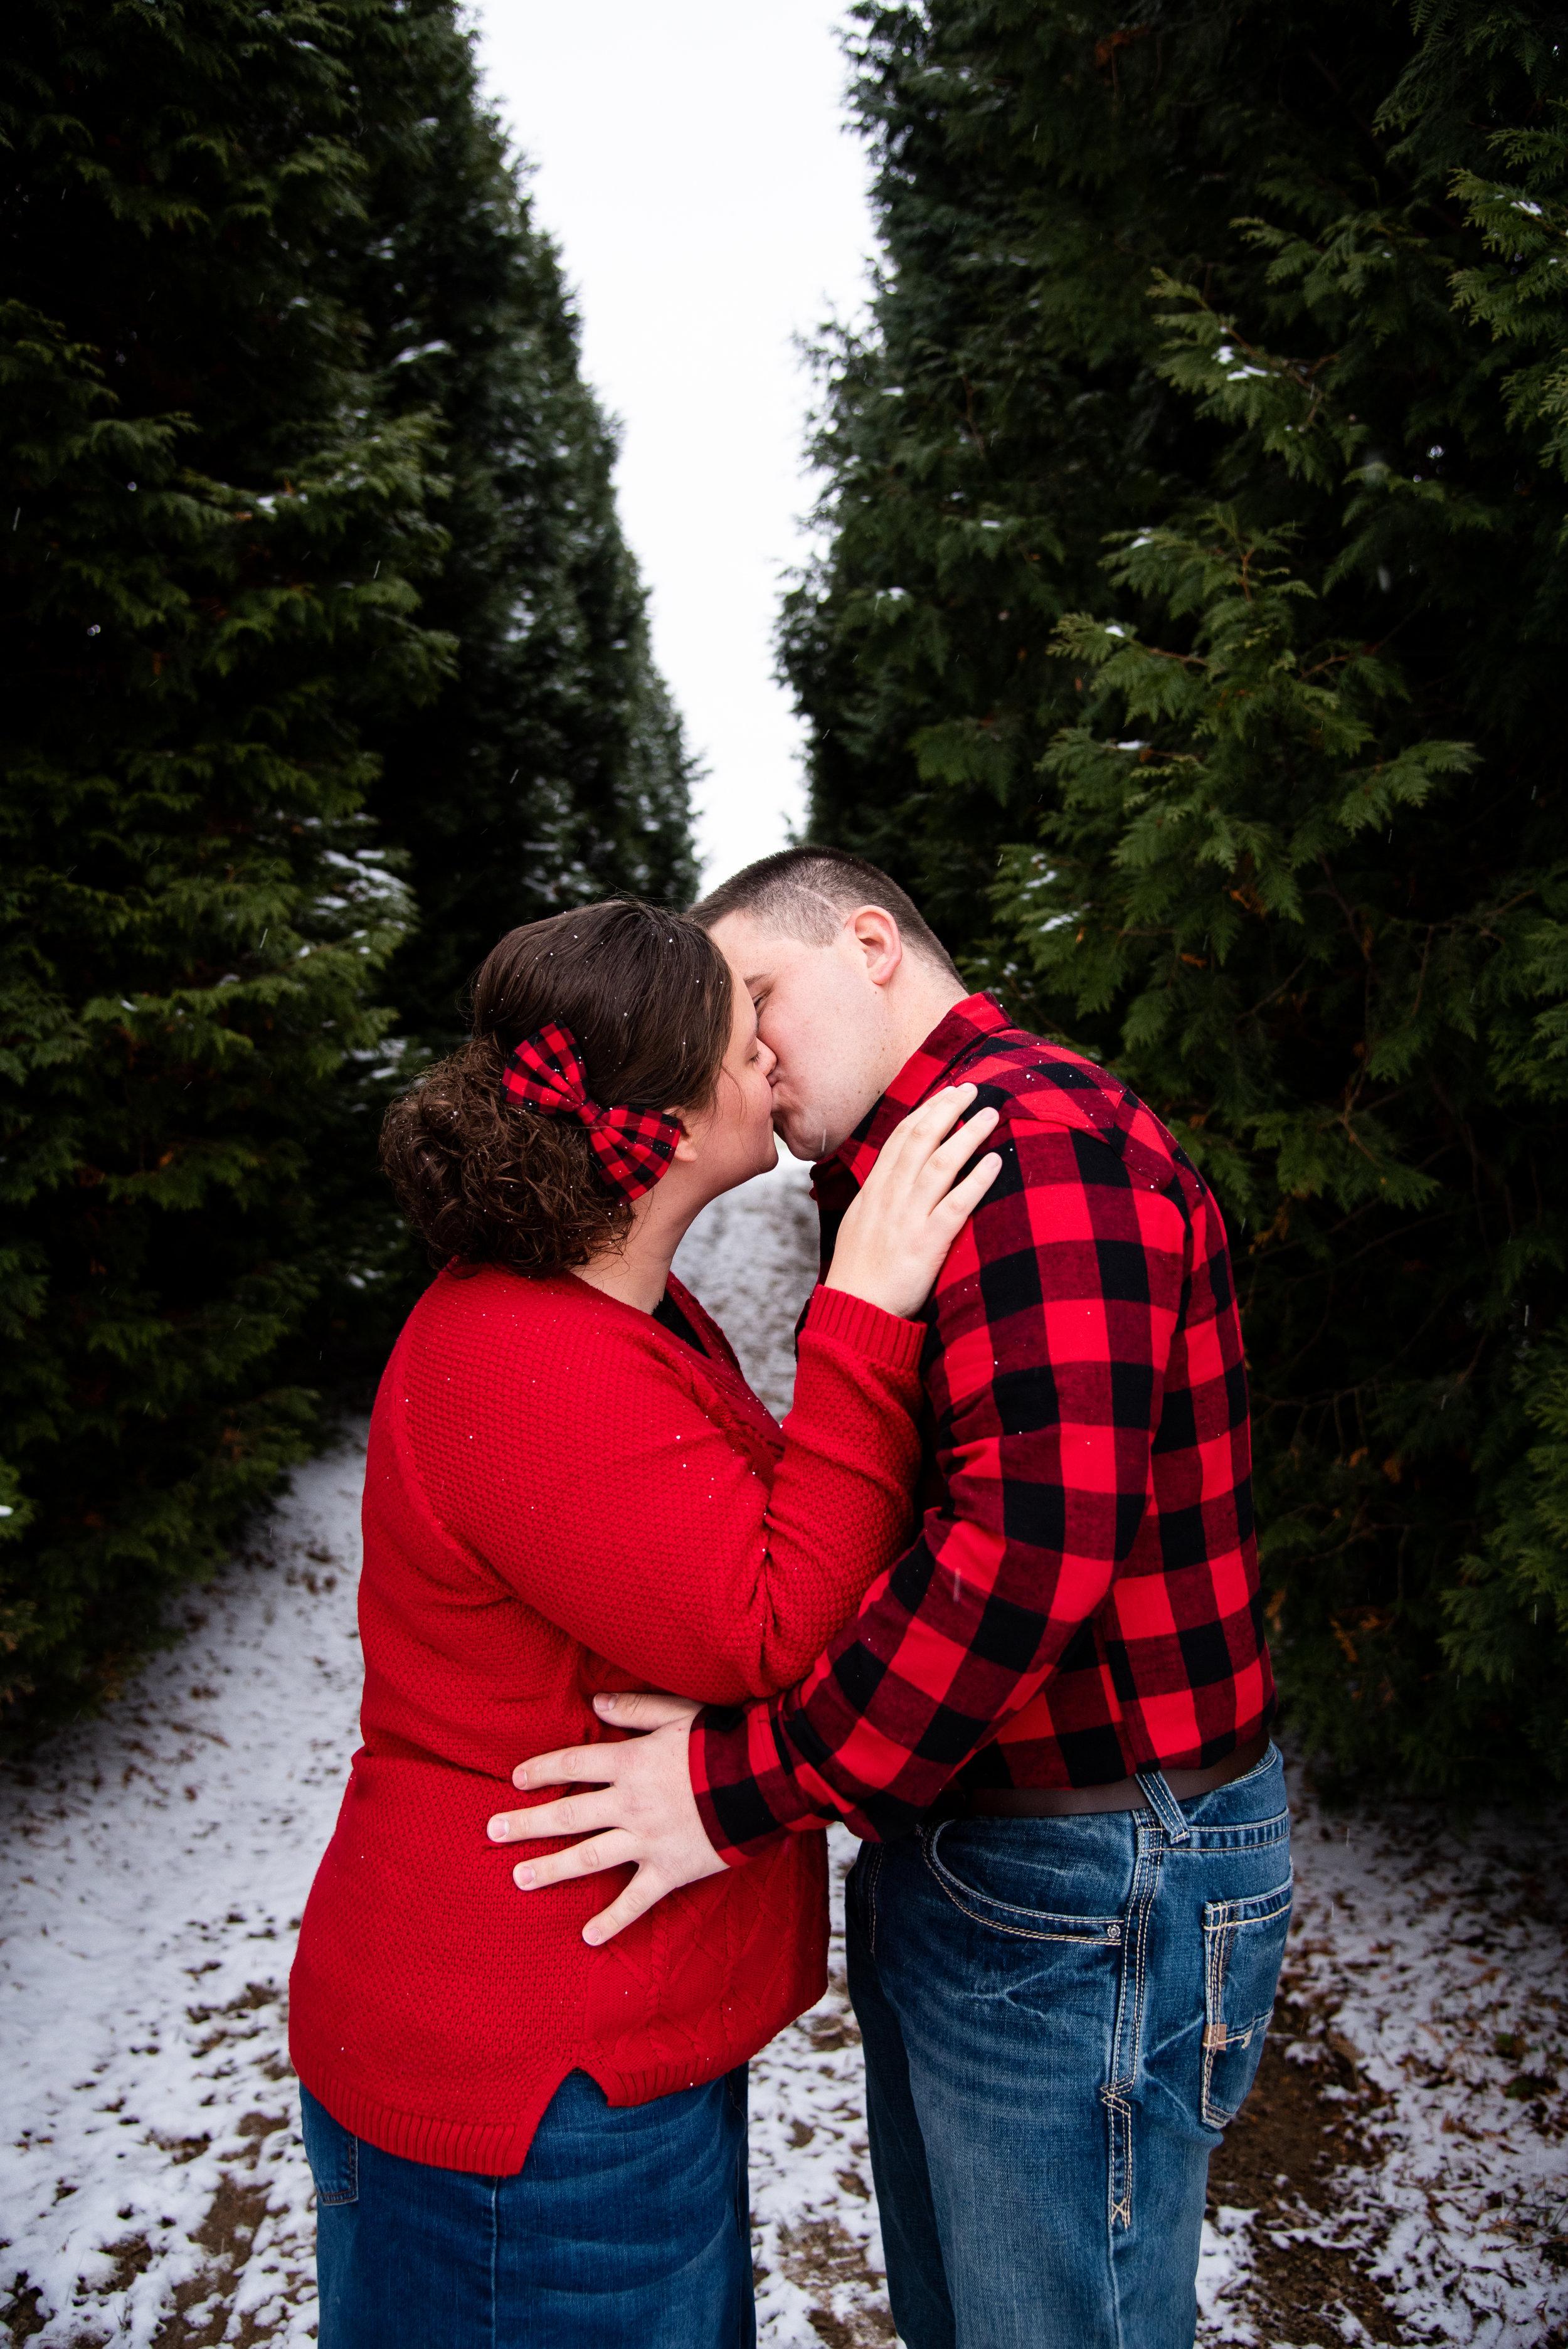 Kyla Jo Photography // Muncie, Indiana // Couple Photographer // Whitetail Tree Farm // Christmas Photos // Midwest Photographer // Indianapolis Photographer // Kissing Couple